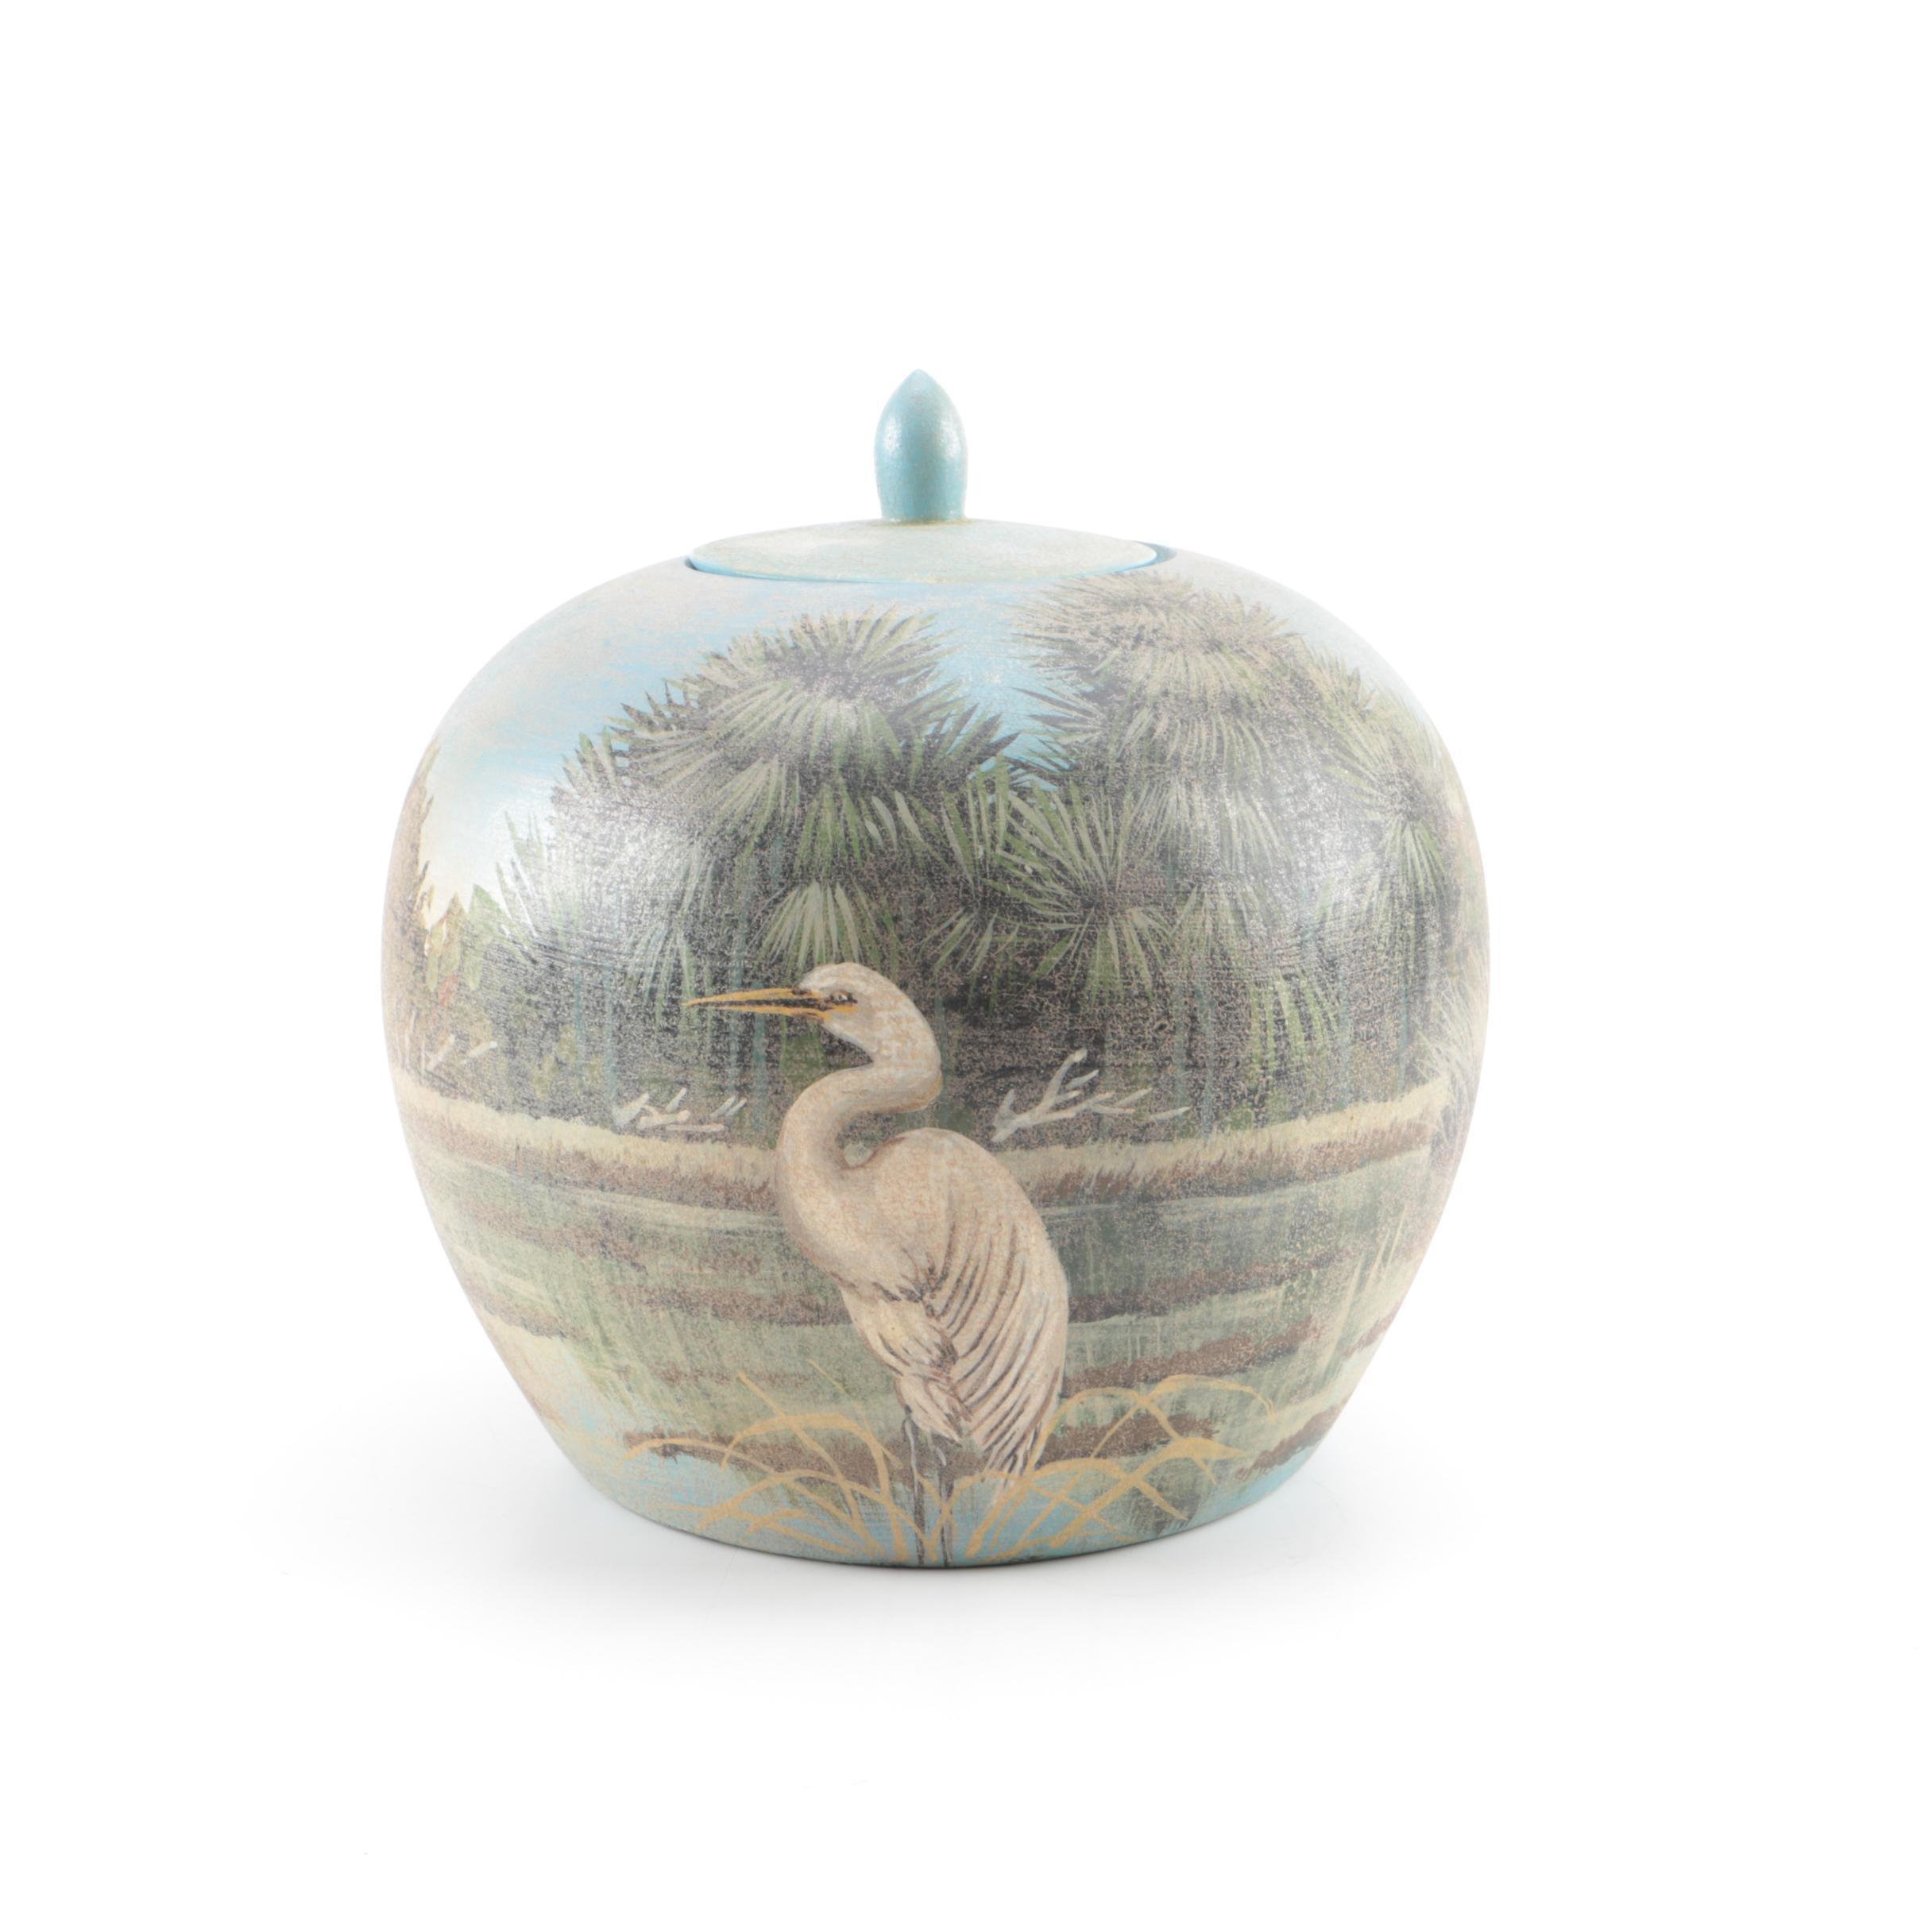 Chinese Ceramic Lidded Urn